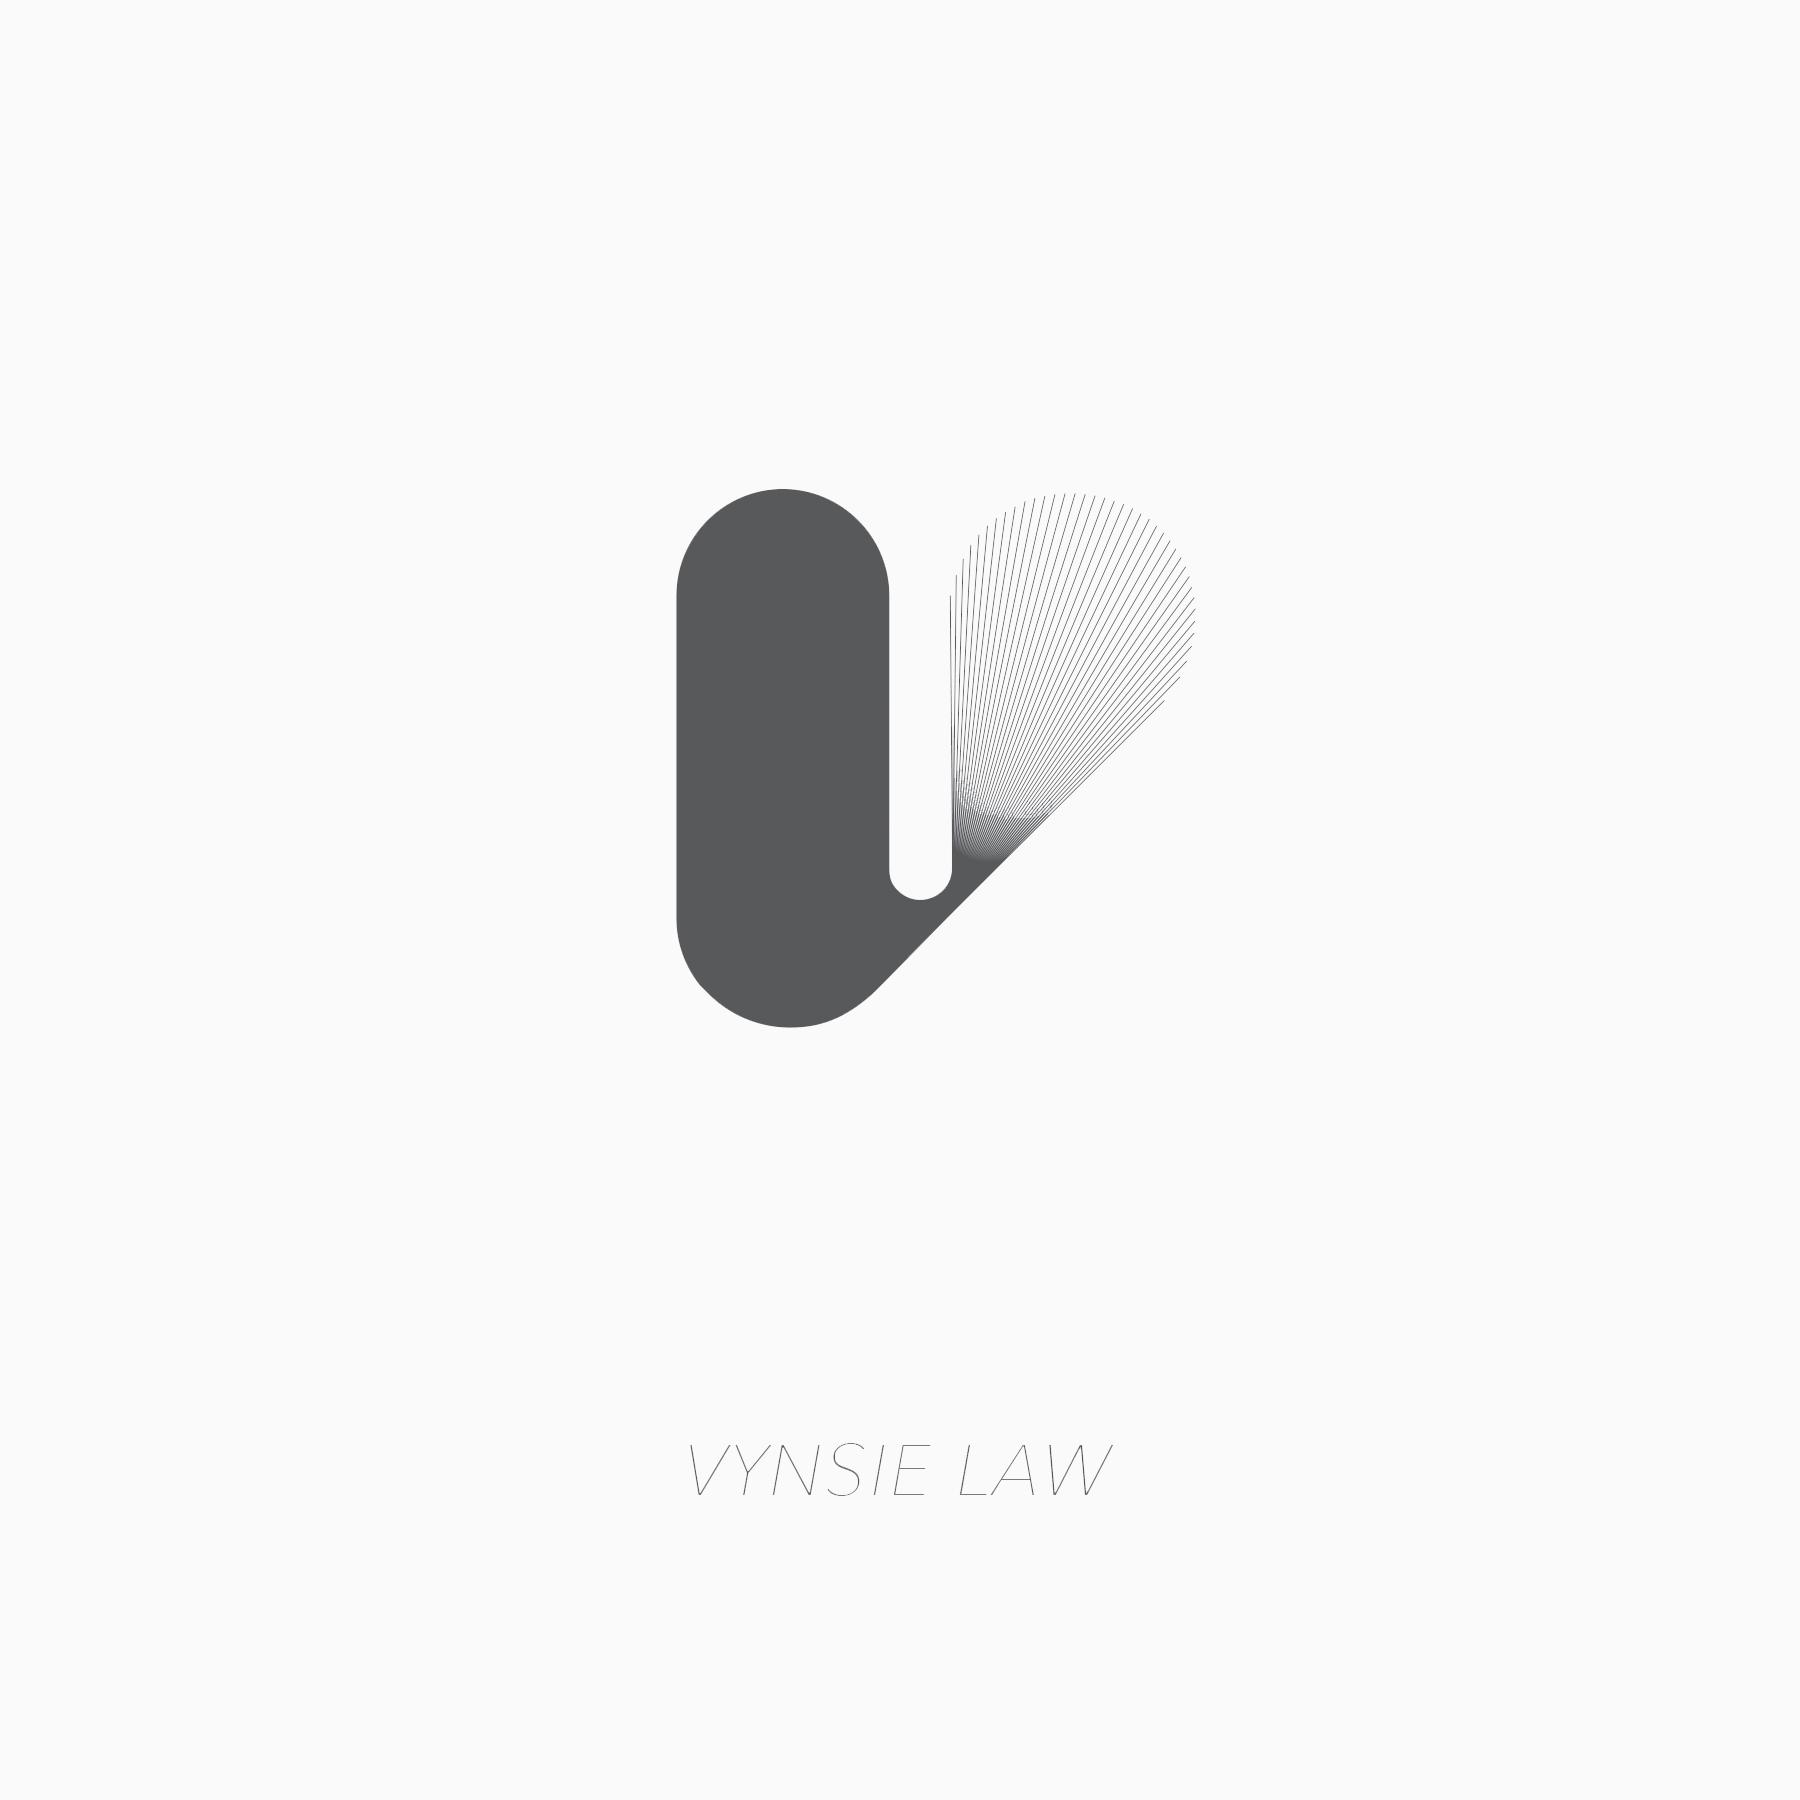 Logo_1976_VL_copy.png